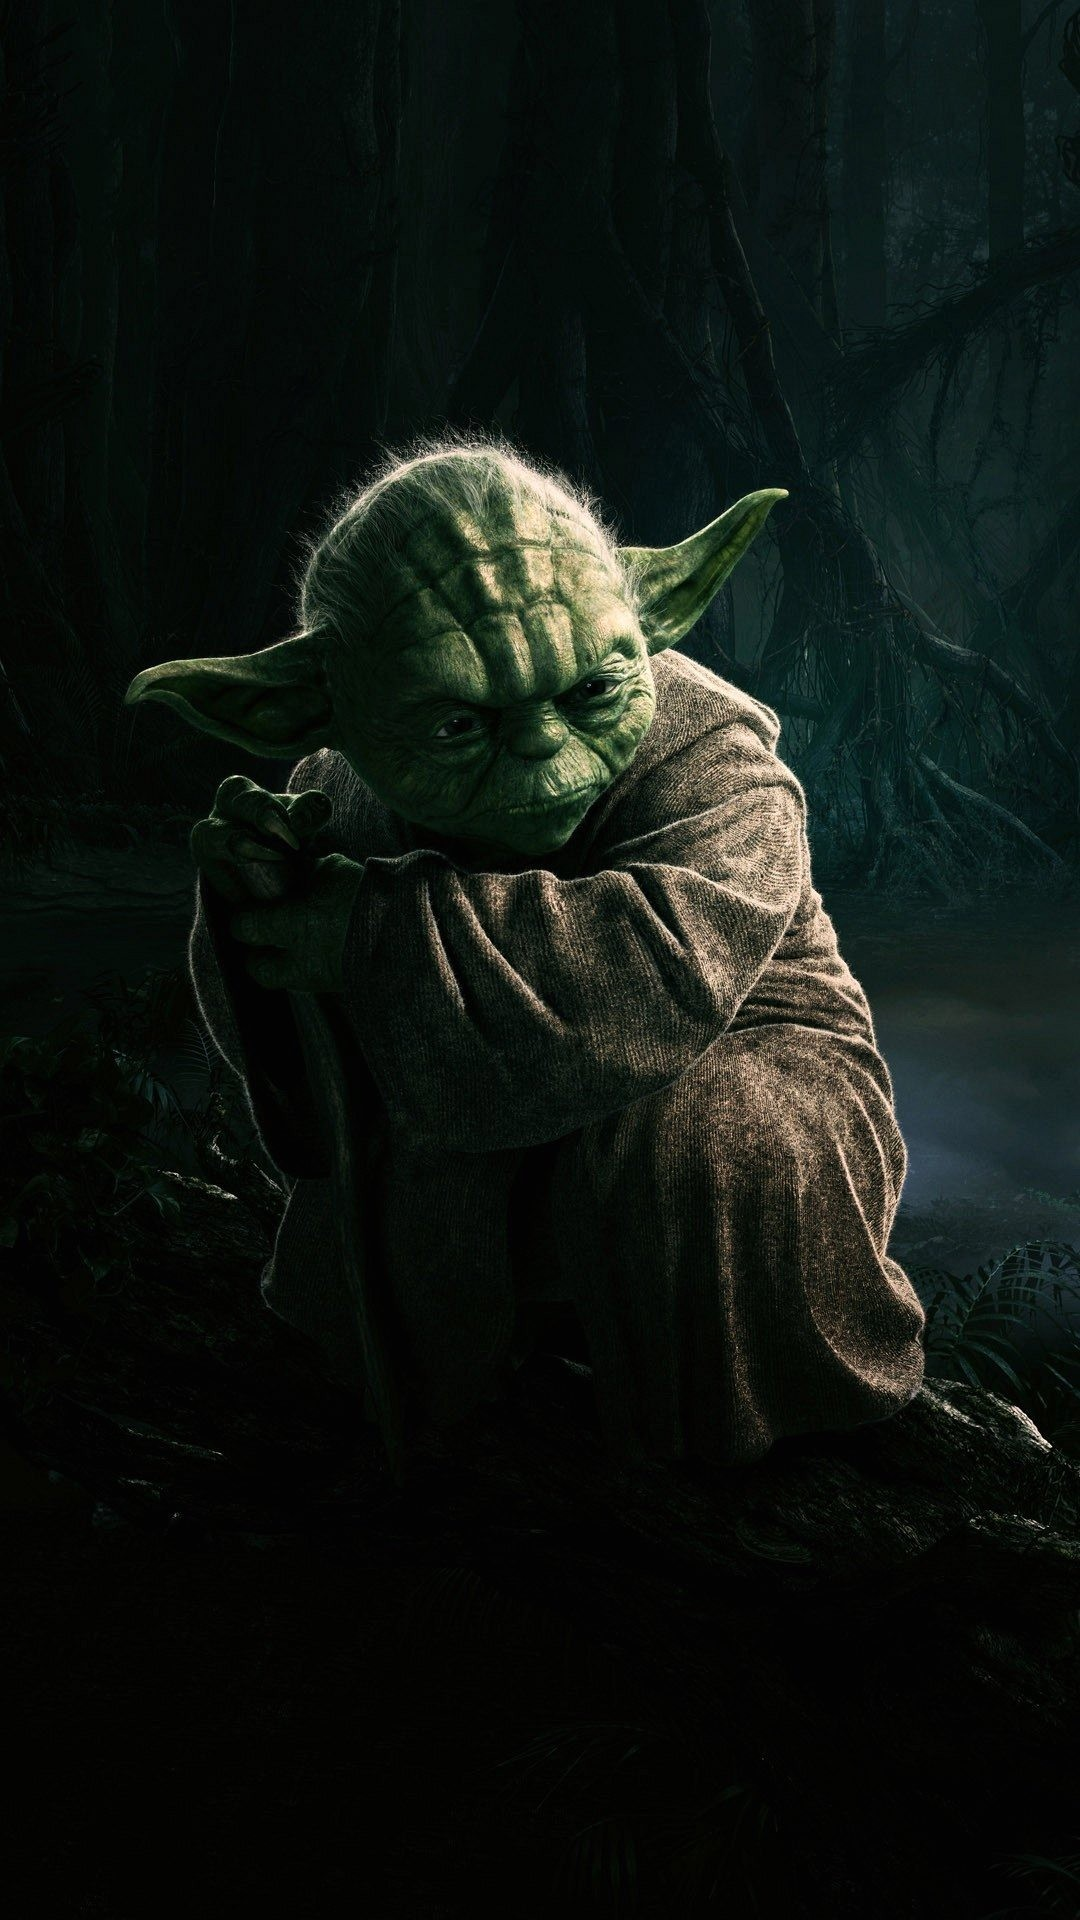 Yoda Star Wars Wallpaper photos of Epic Star Wars Iphone Wallpaper: by .